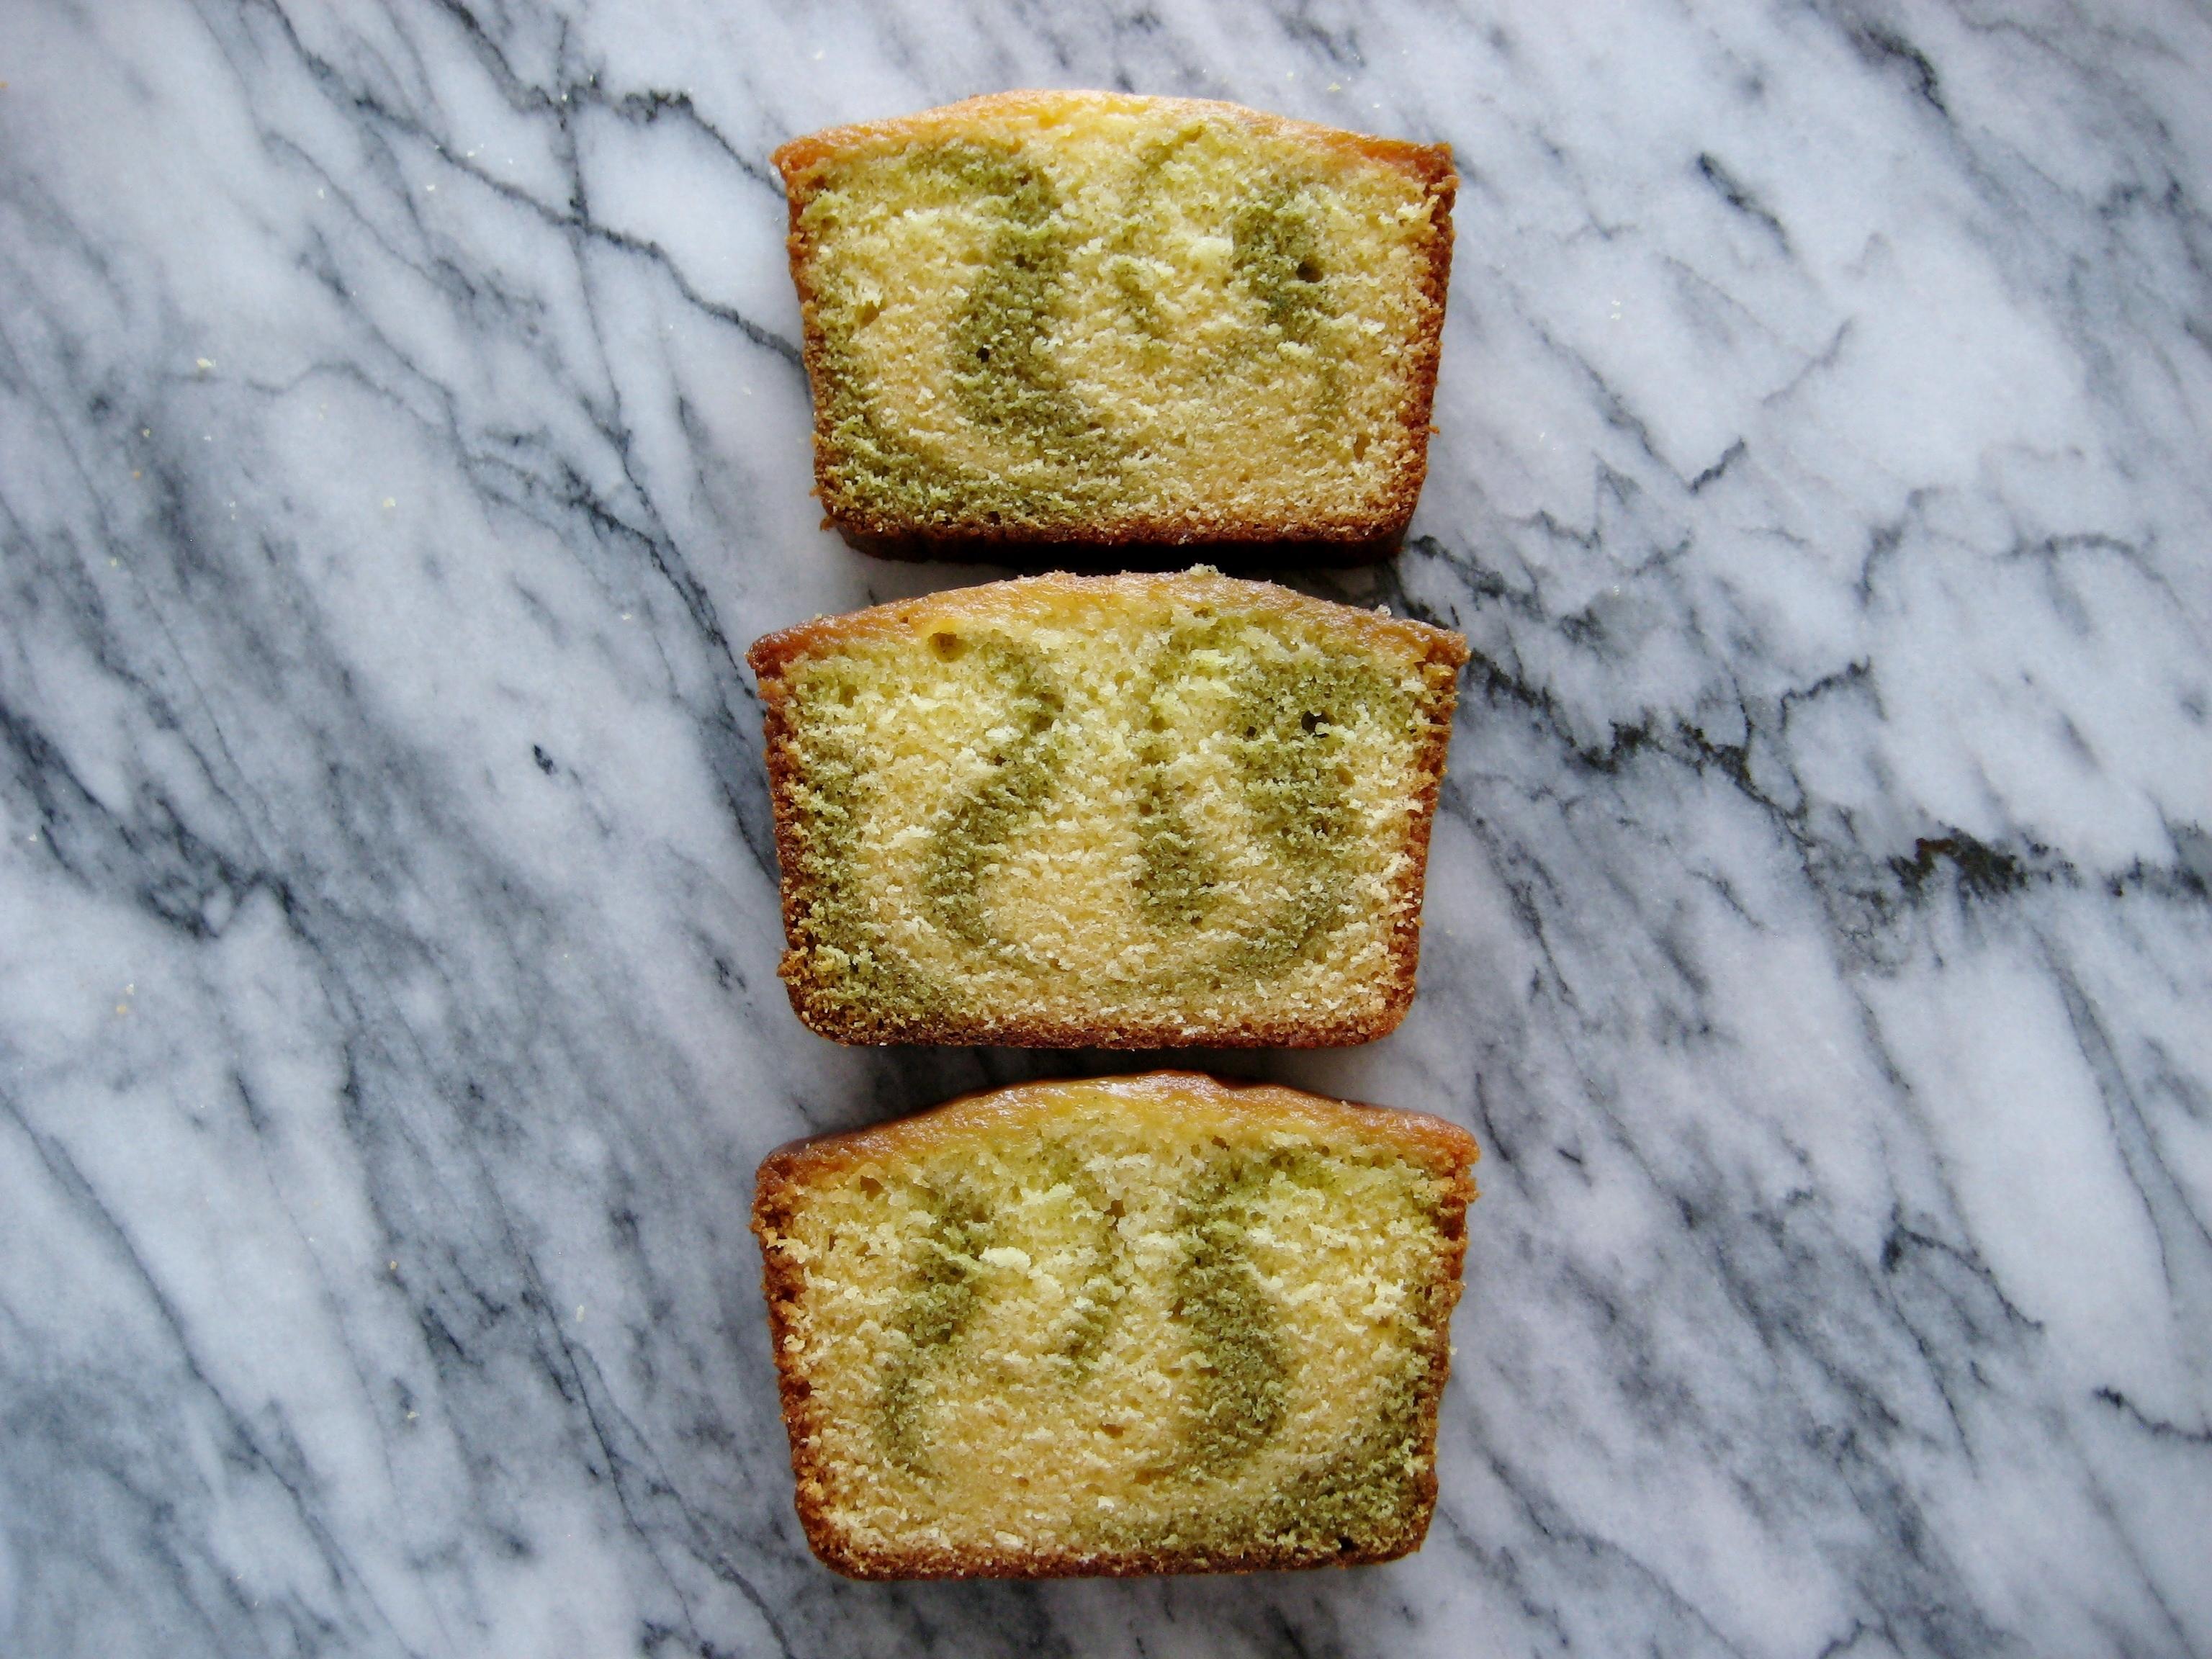 Lemon and Matcha Marble Pound Cake. makes one 9x5x4-inch pound cake ...